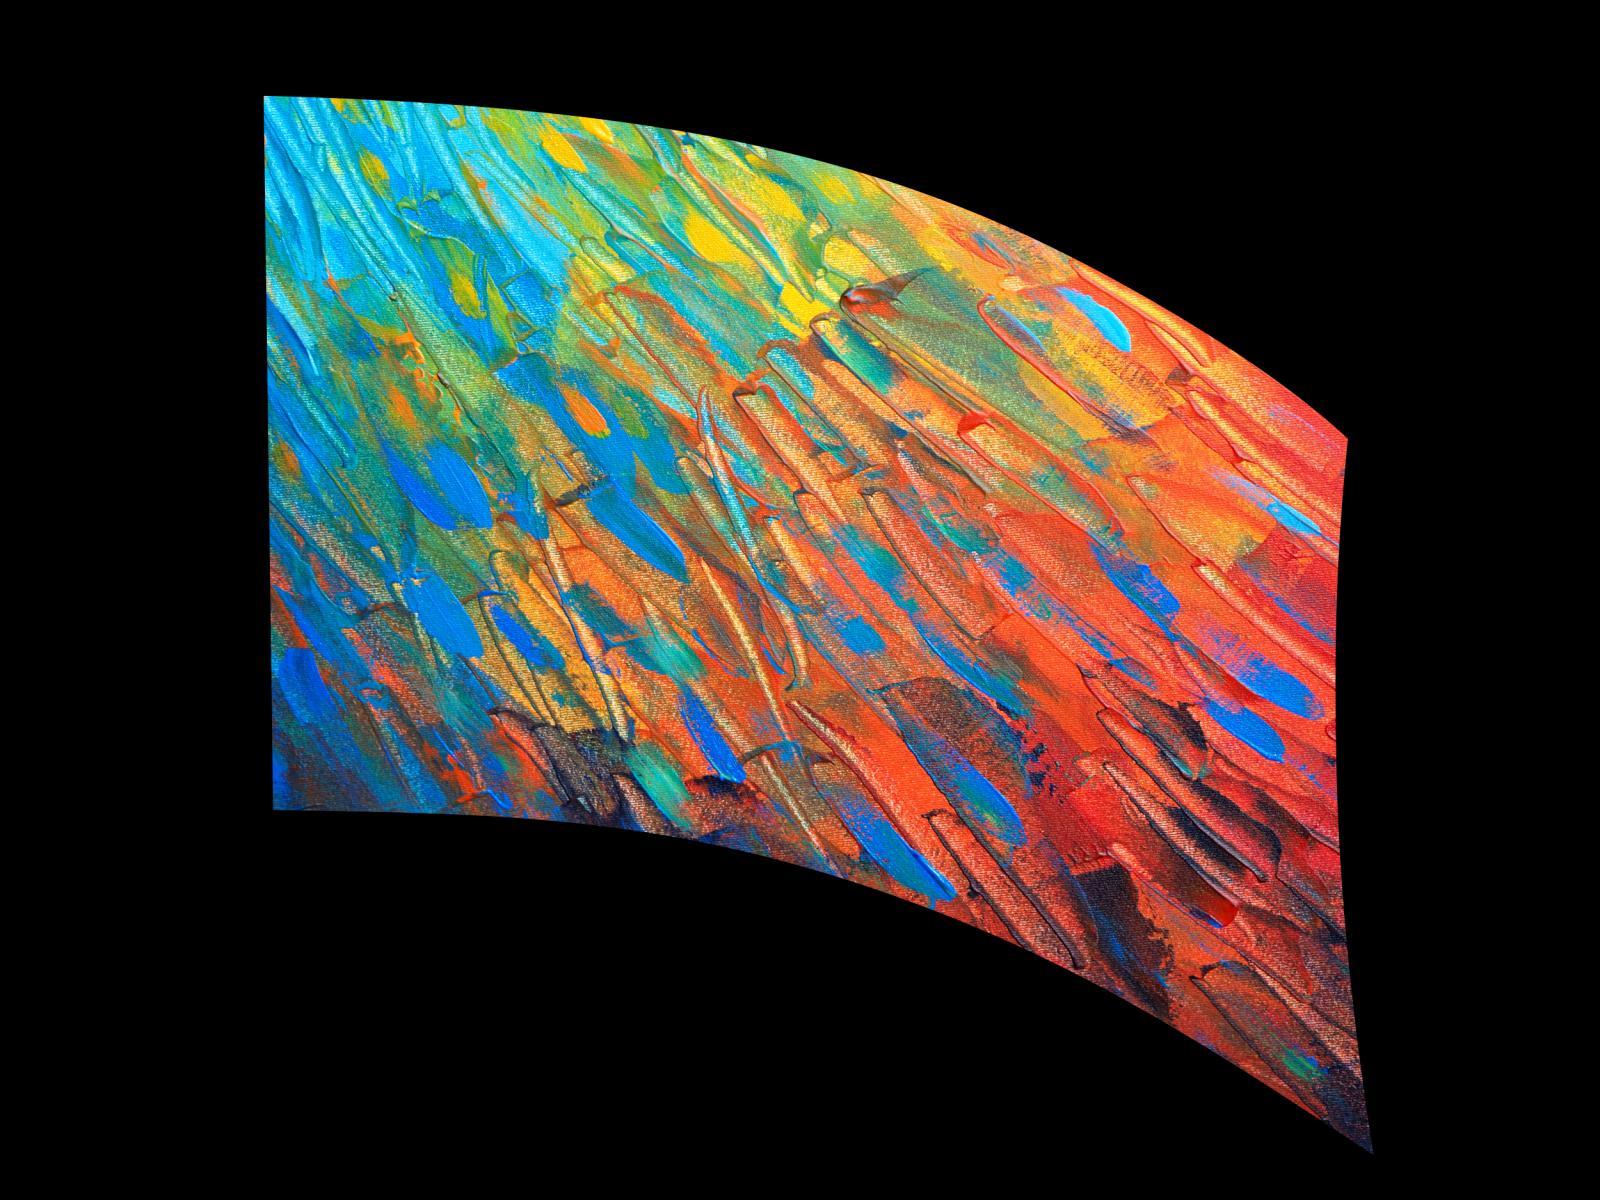 020307s - 36x54 Standard Paint Strokes 1